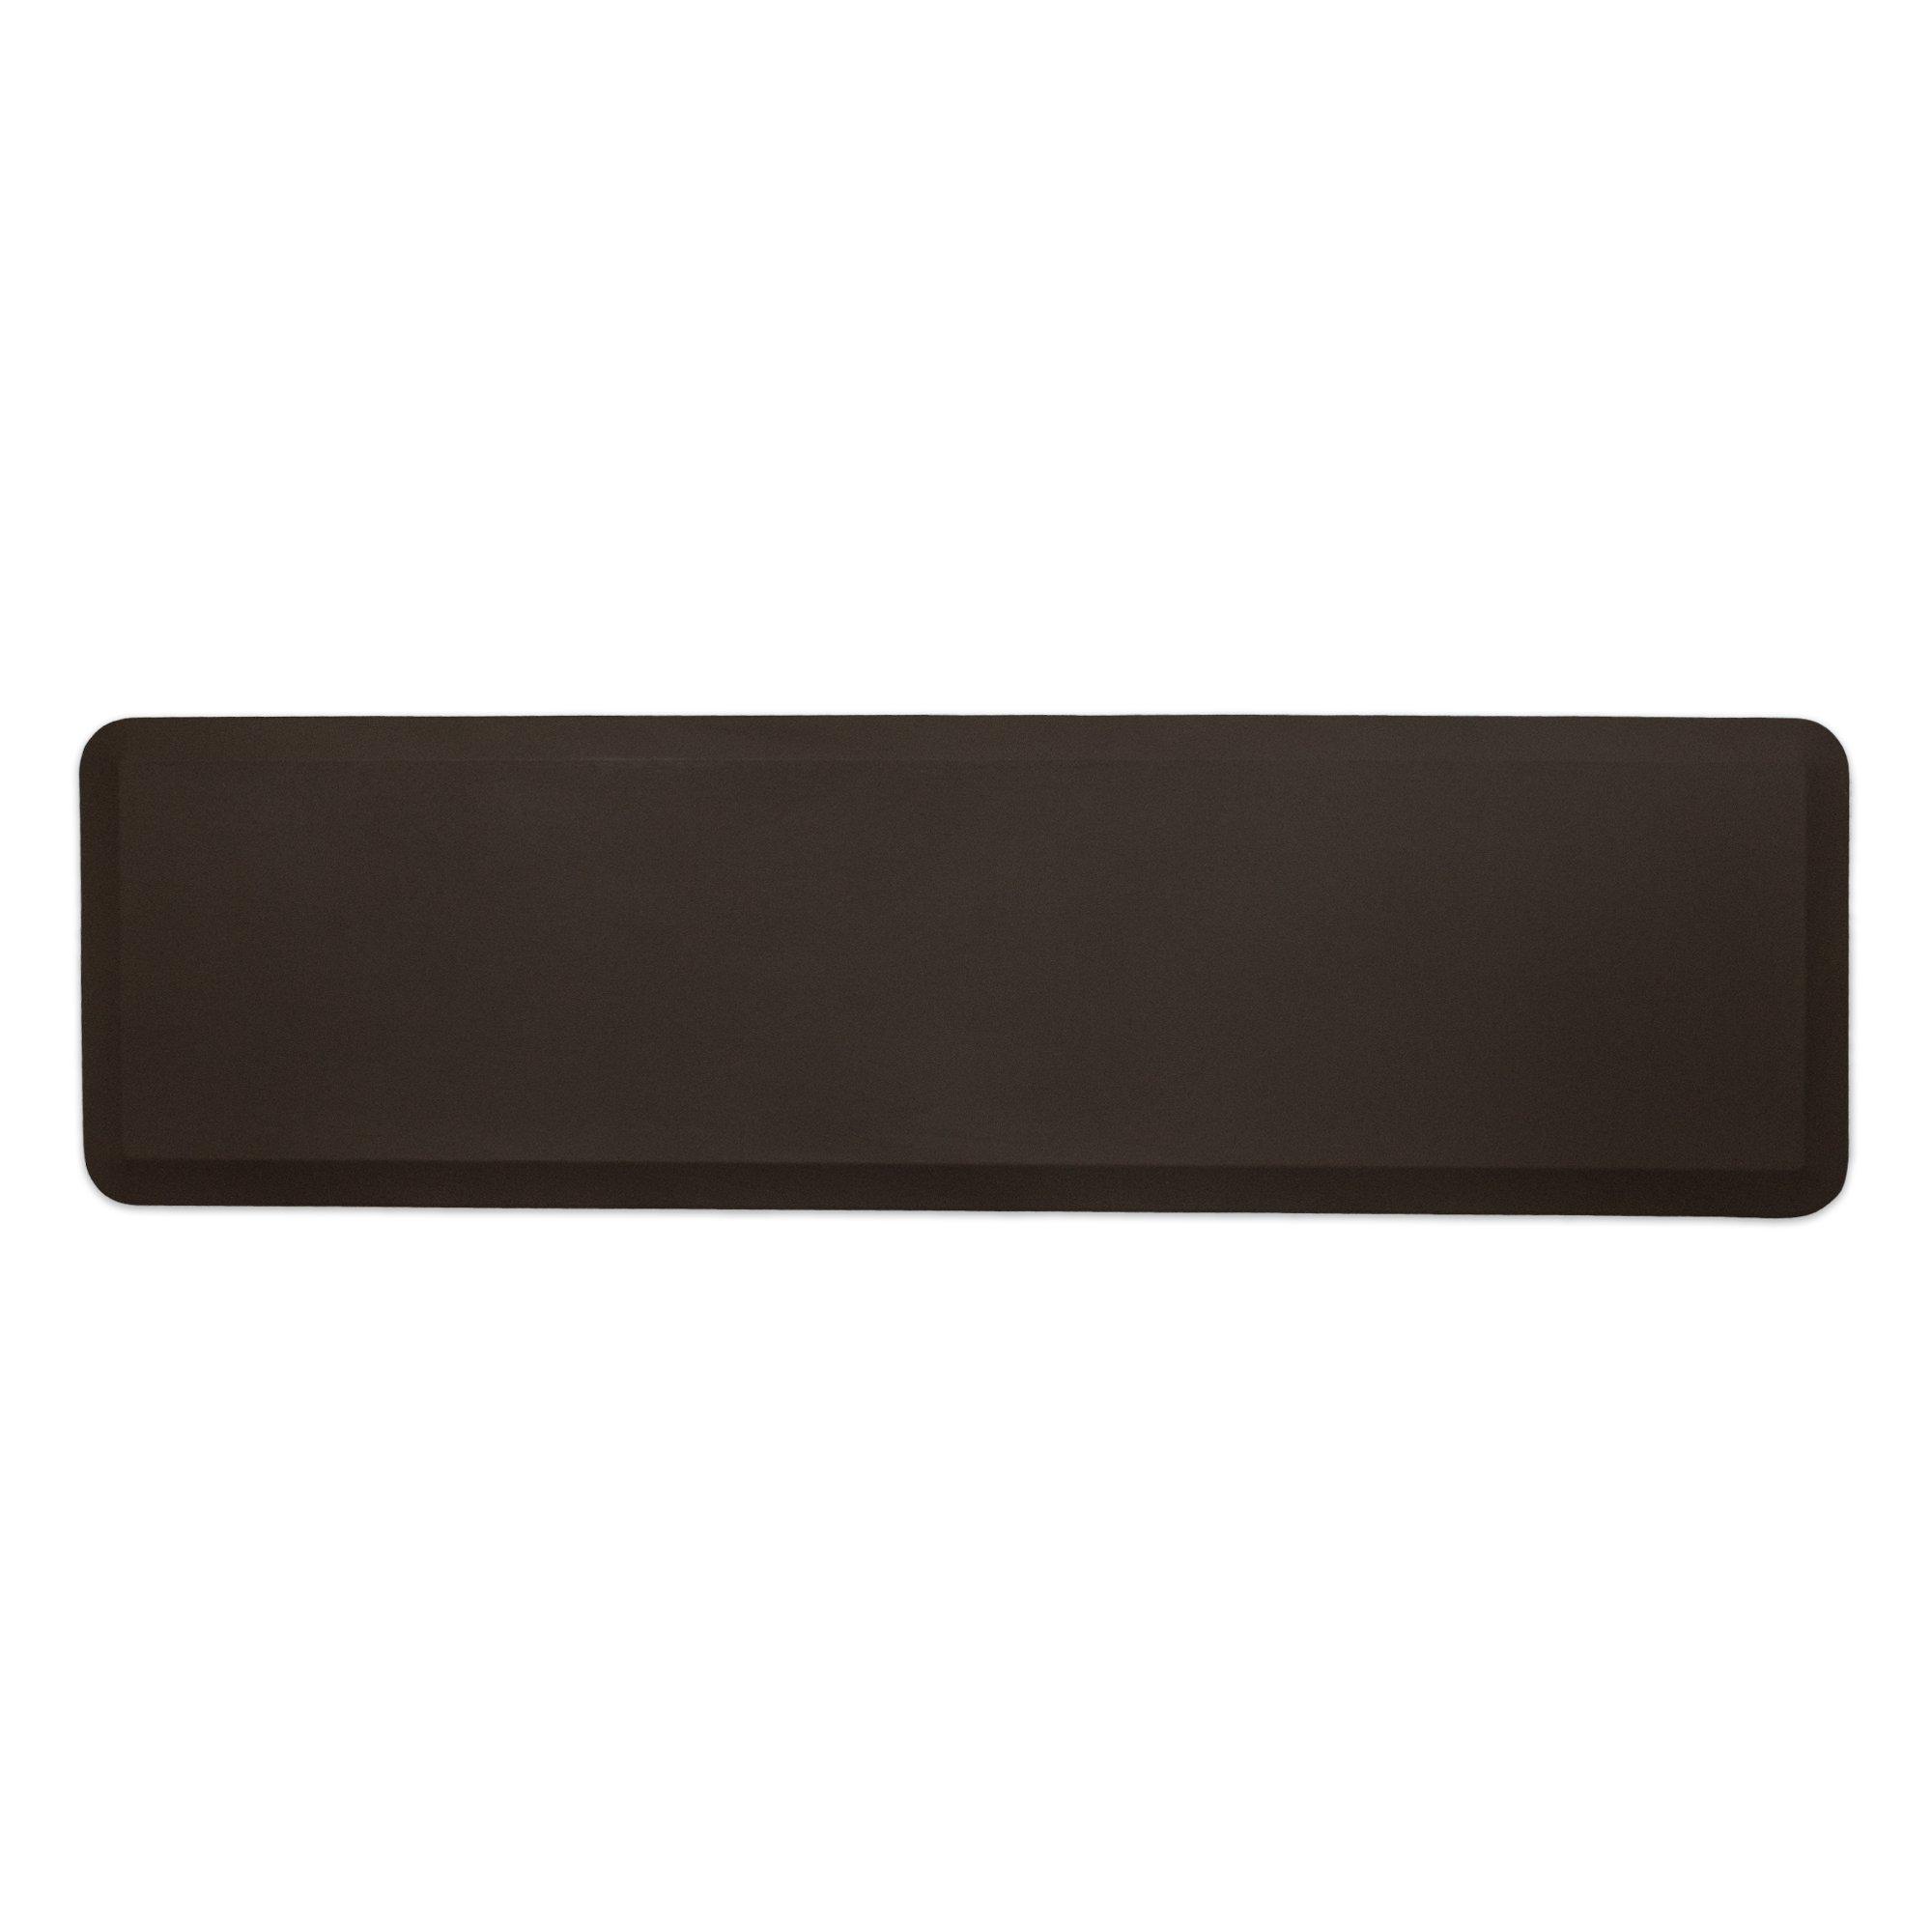 "NewLife by GelPro Professional Grade Anti-Fatigue Kitchen & Office Comfort Mat, 20x72, Earth ¾"" Bio-Foam Mat with non-slip bottom for health & wellness"